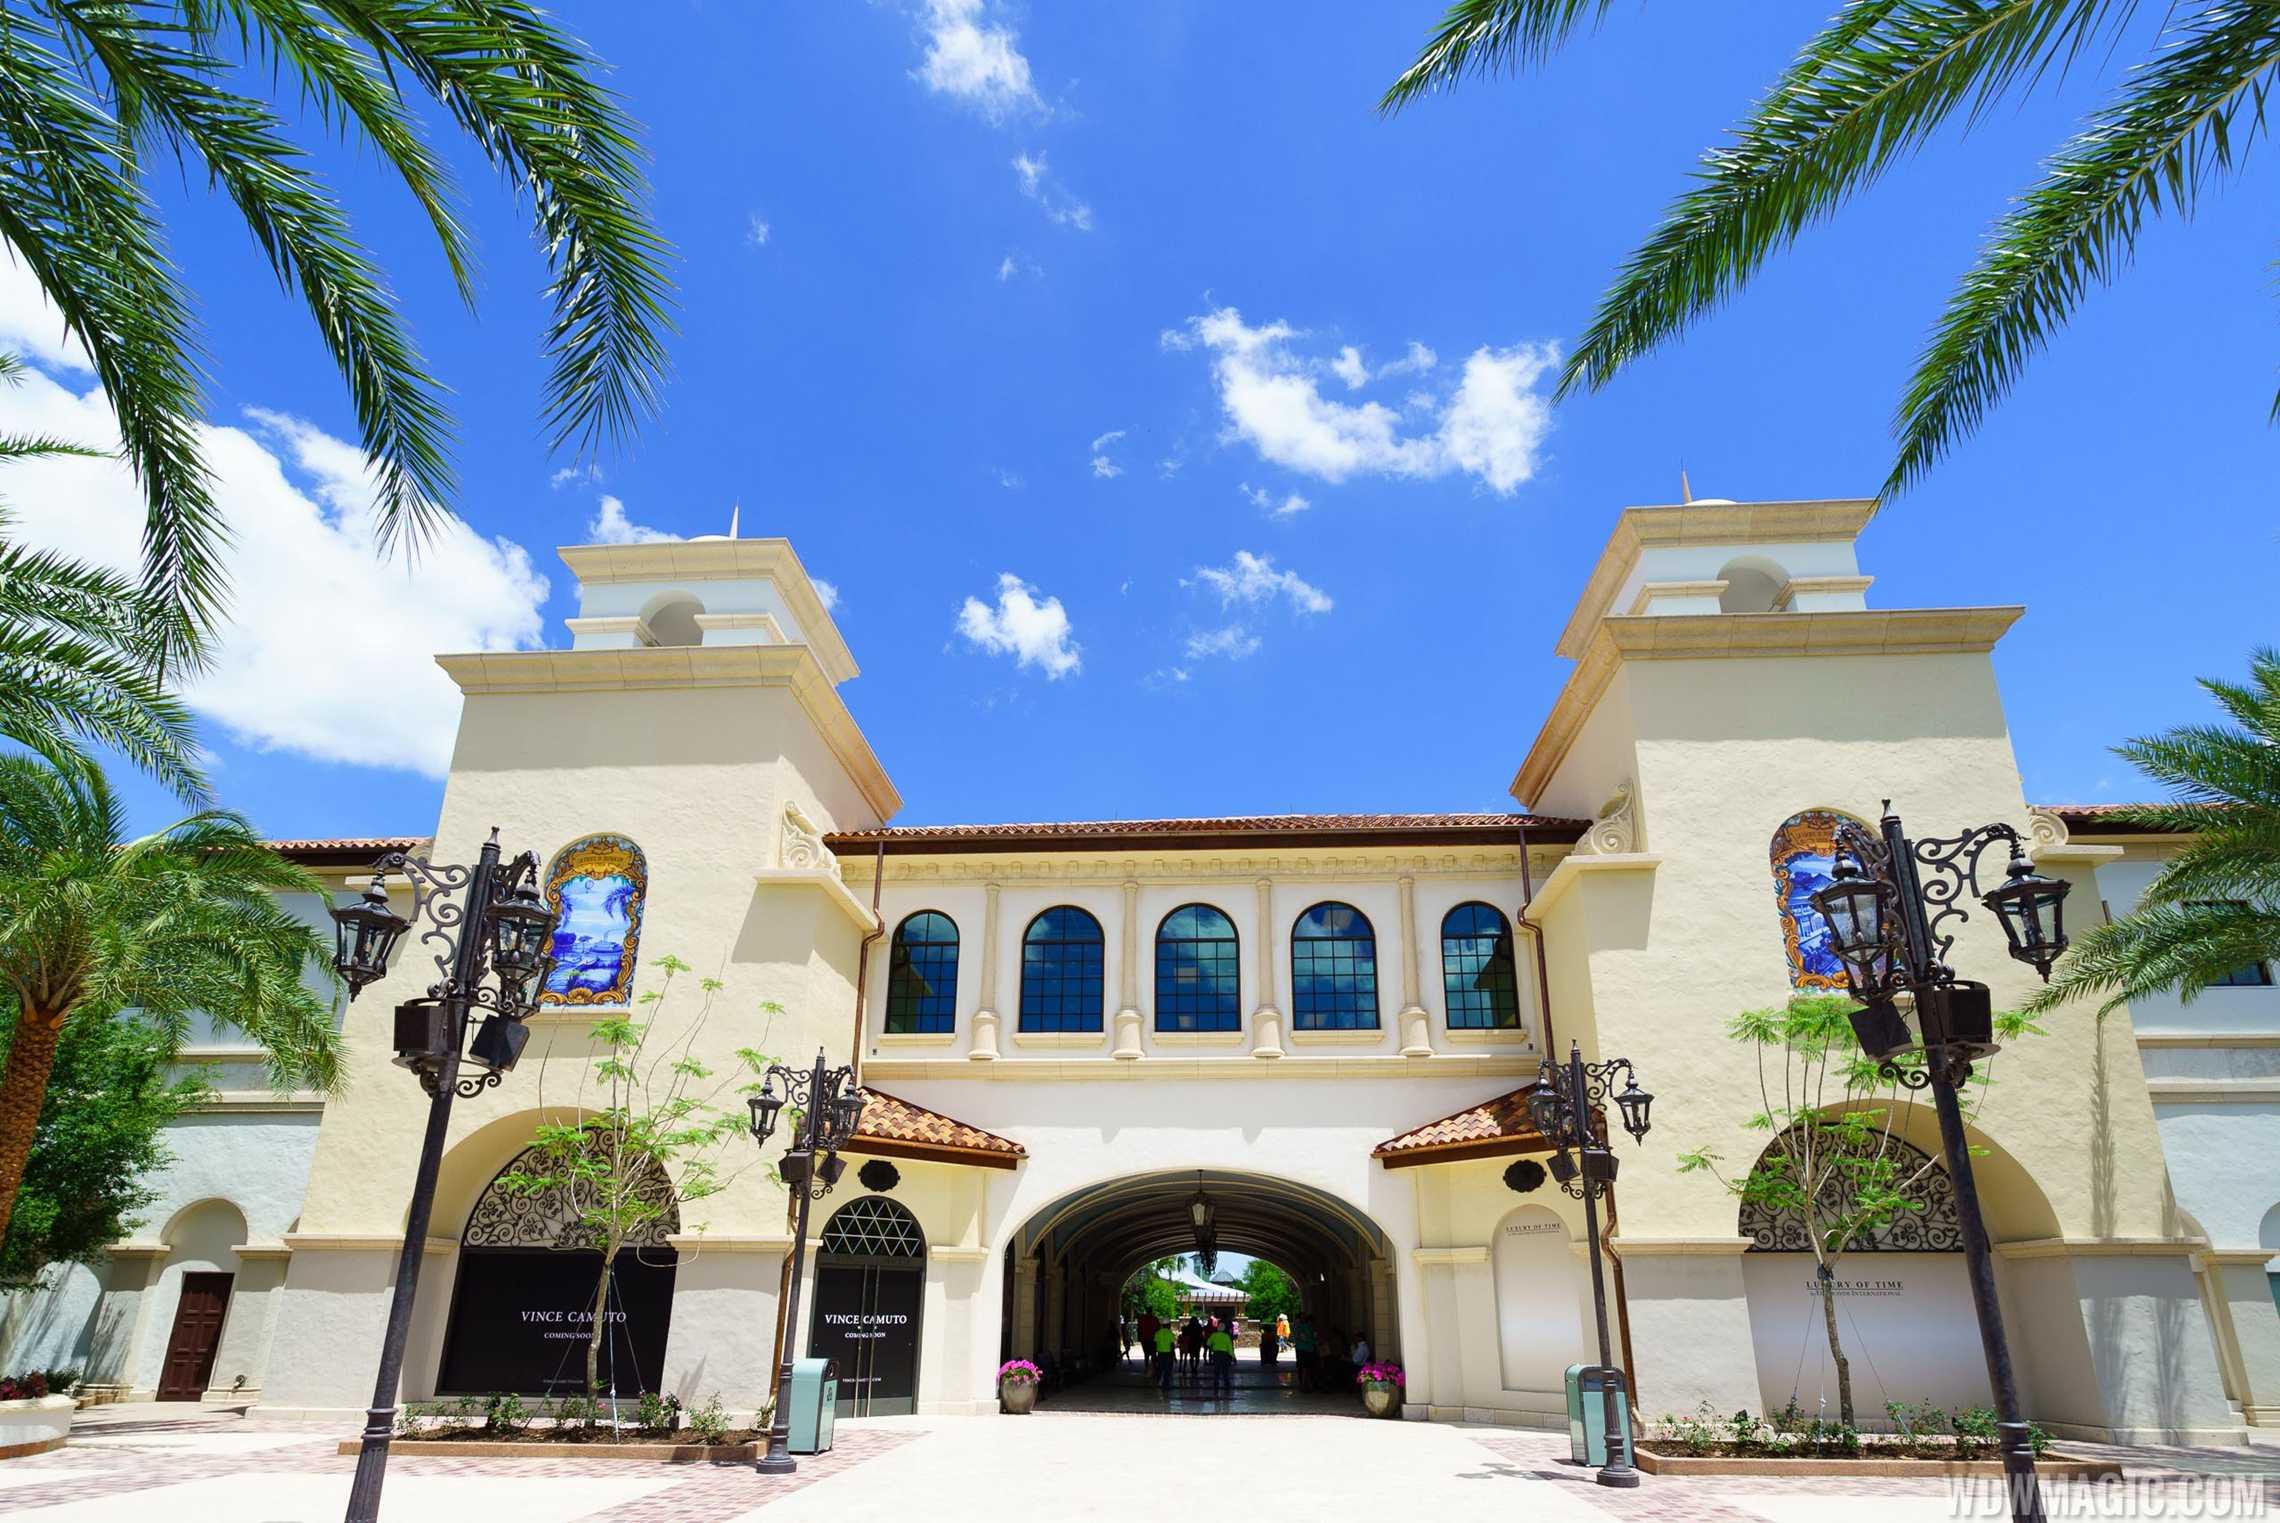 Disney Springs main entrance